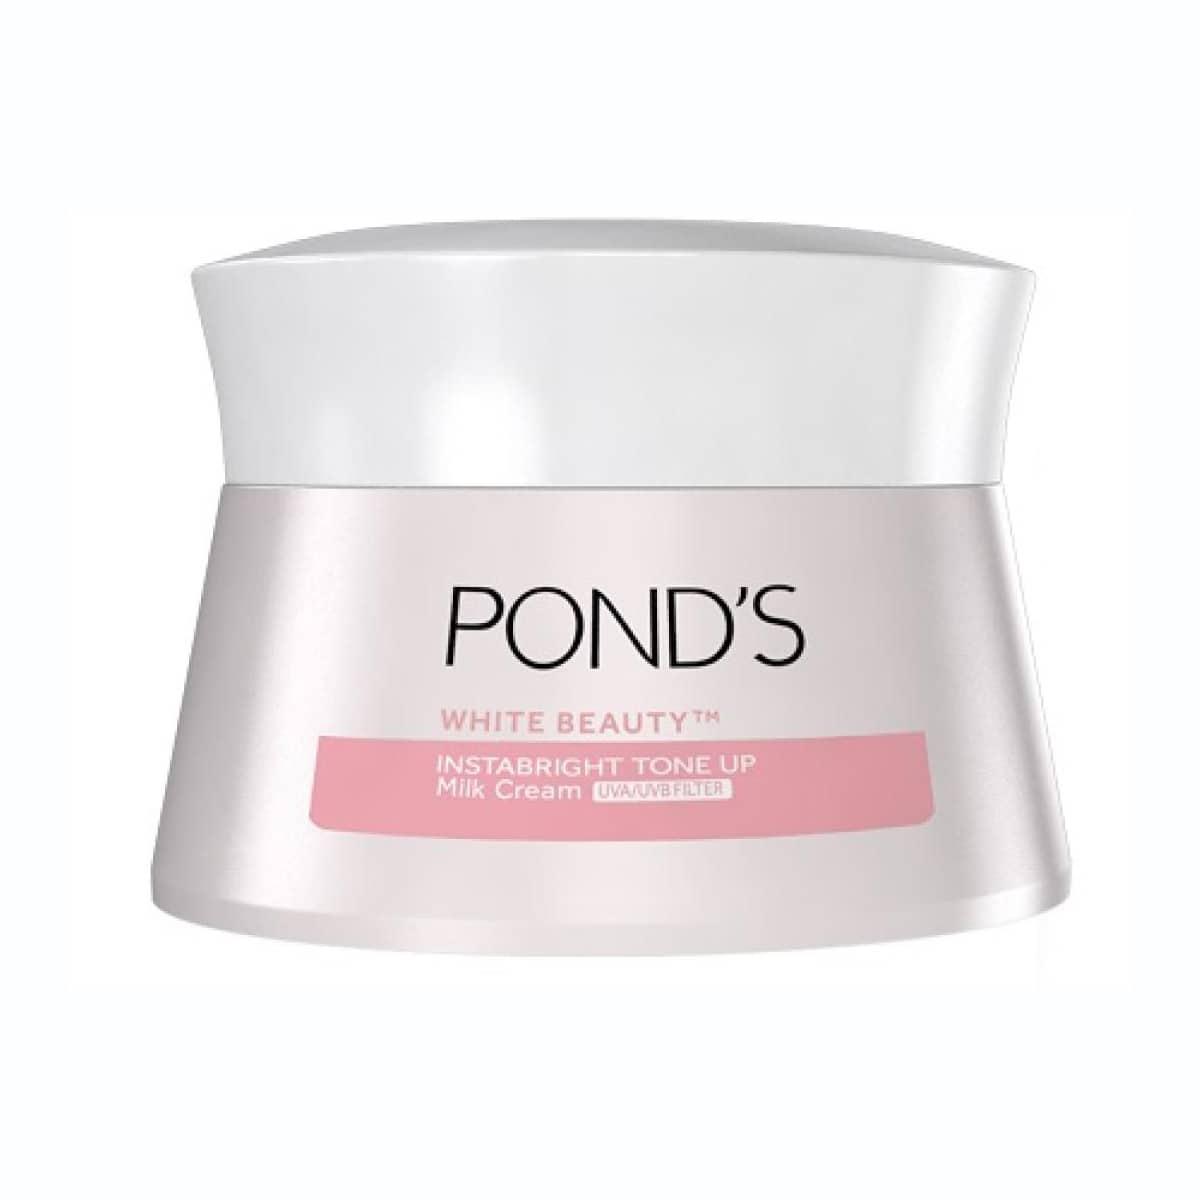 Pond's Instabright Tone Up Cream 50g